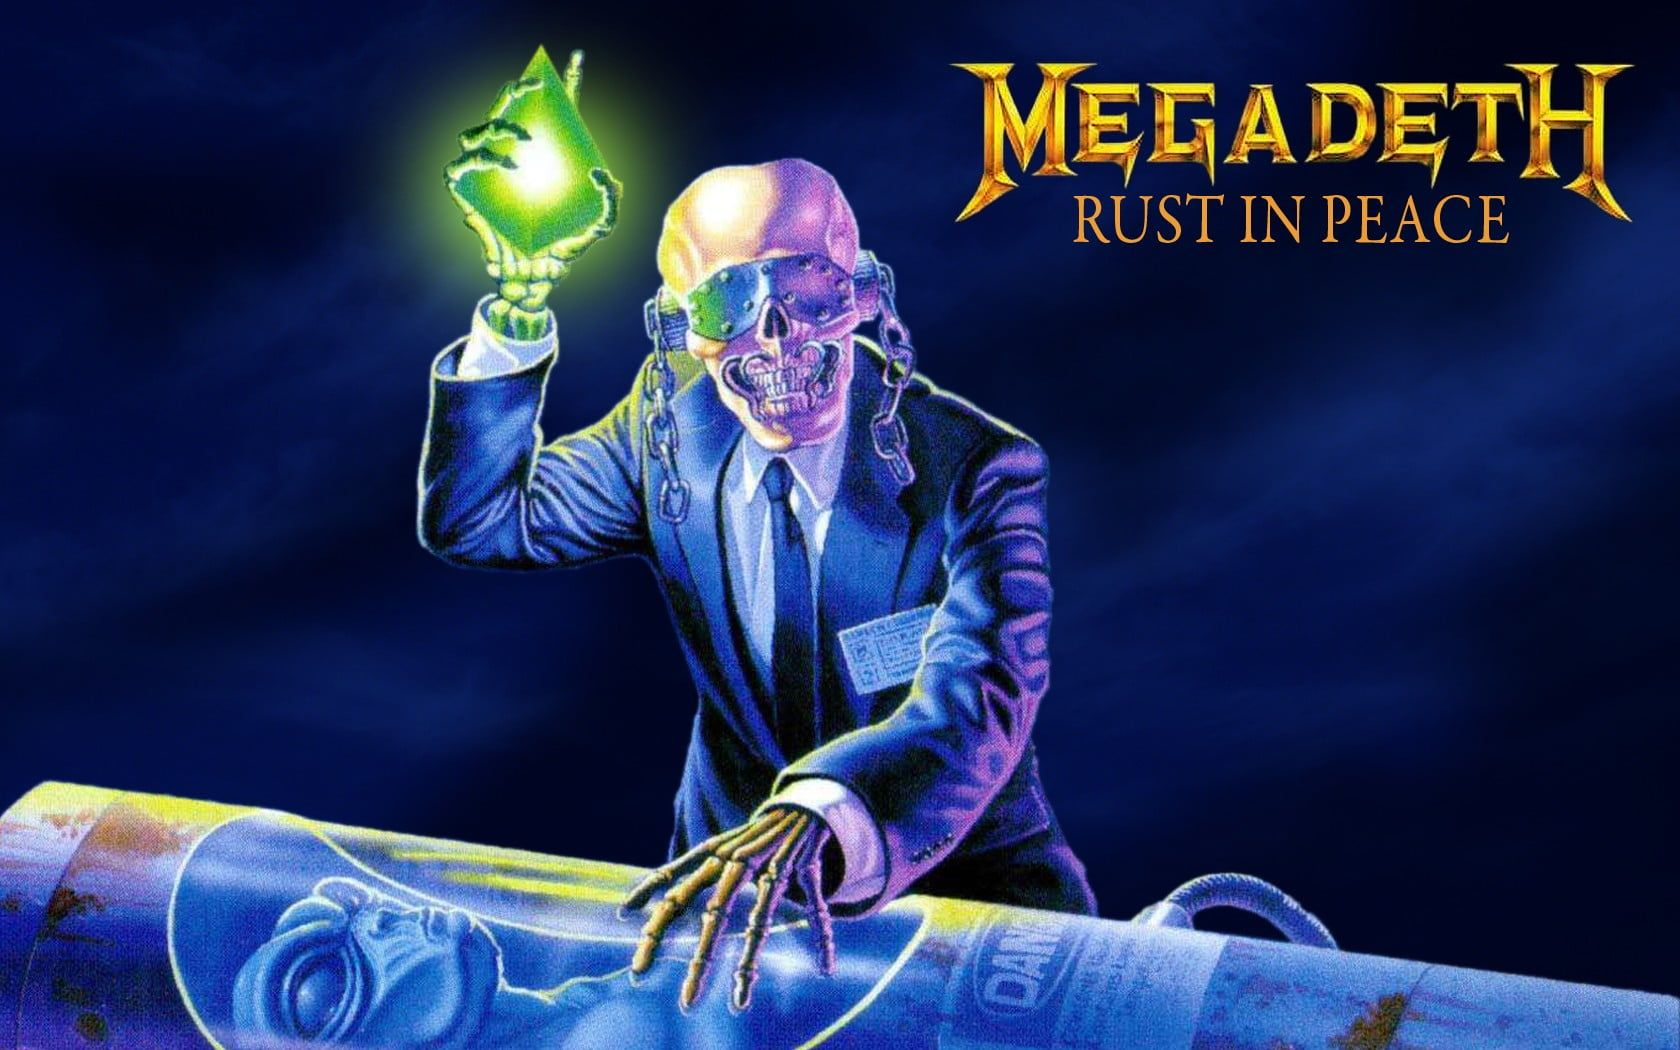 Megadeth Rust In Peace Album Cover Rust In Peace Vic Rattlehead Megadeth Thrash Metal Big 4 Heavy Metal Metal Music Dave Mustaine Band 90s Album Cove Pelangi